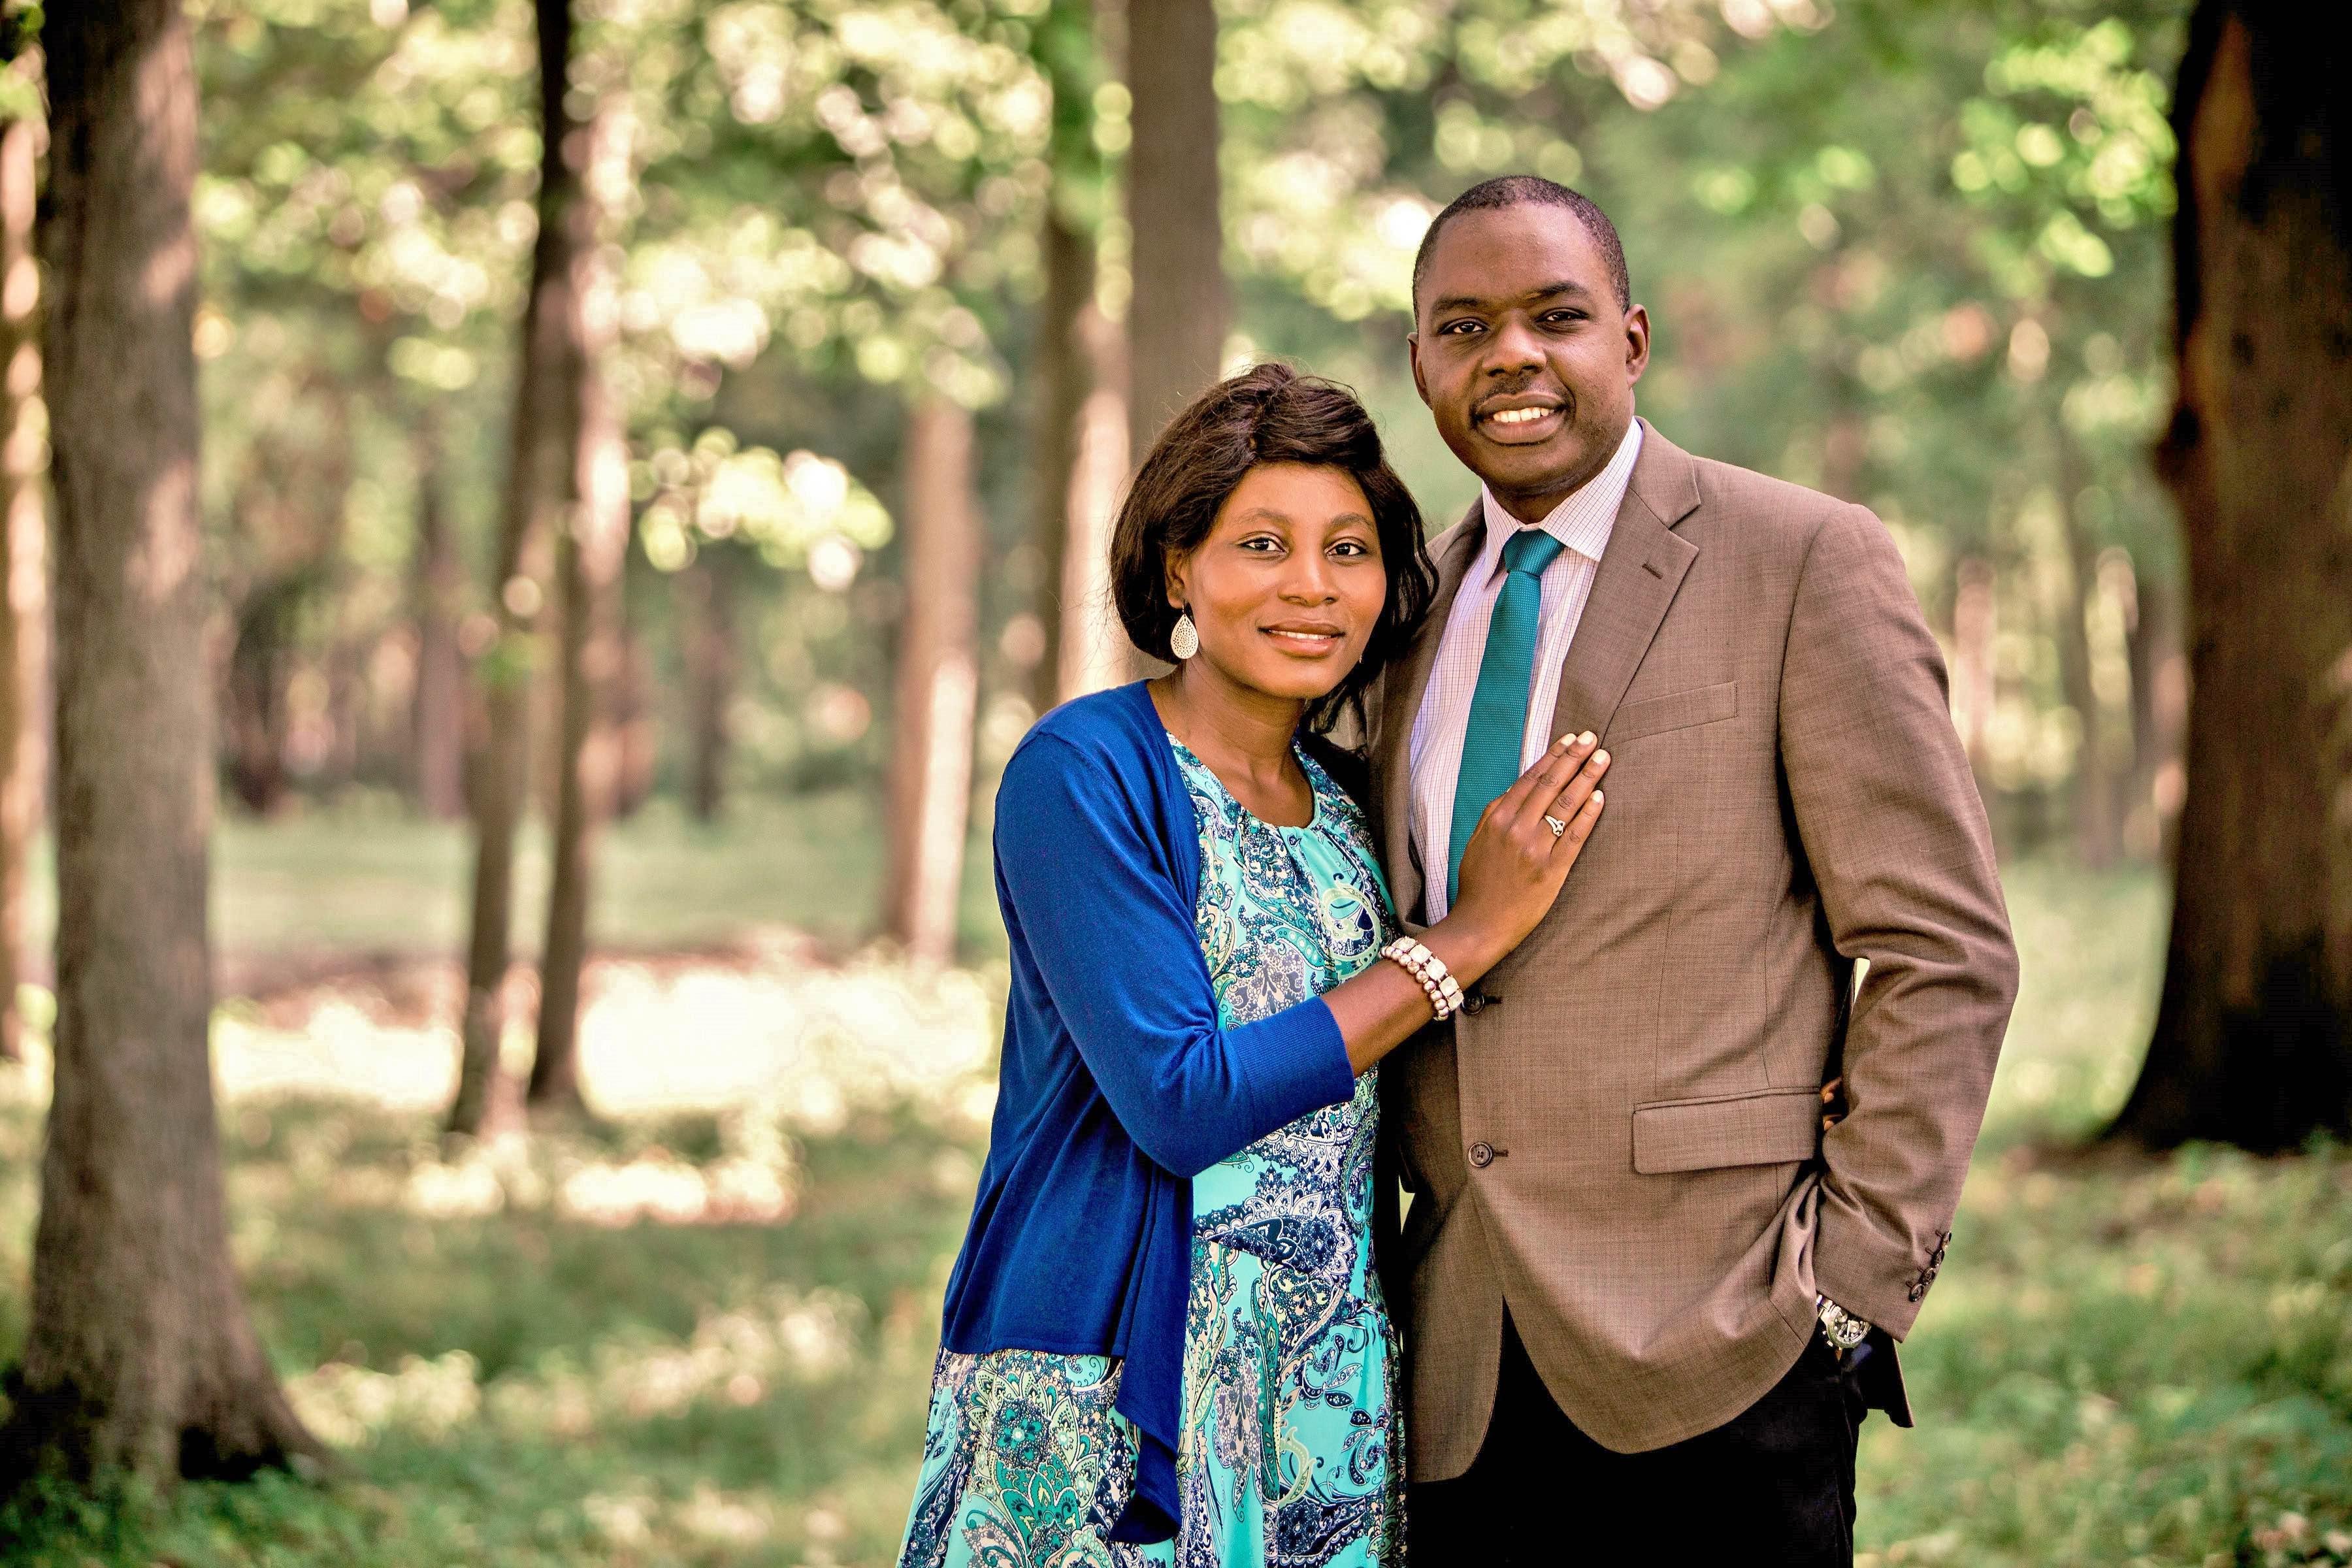 Patrick and Christelle Ndjaboue